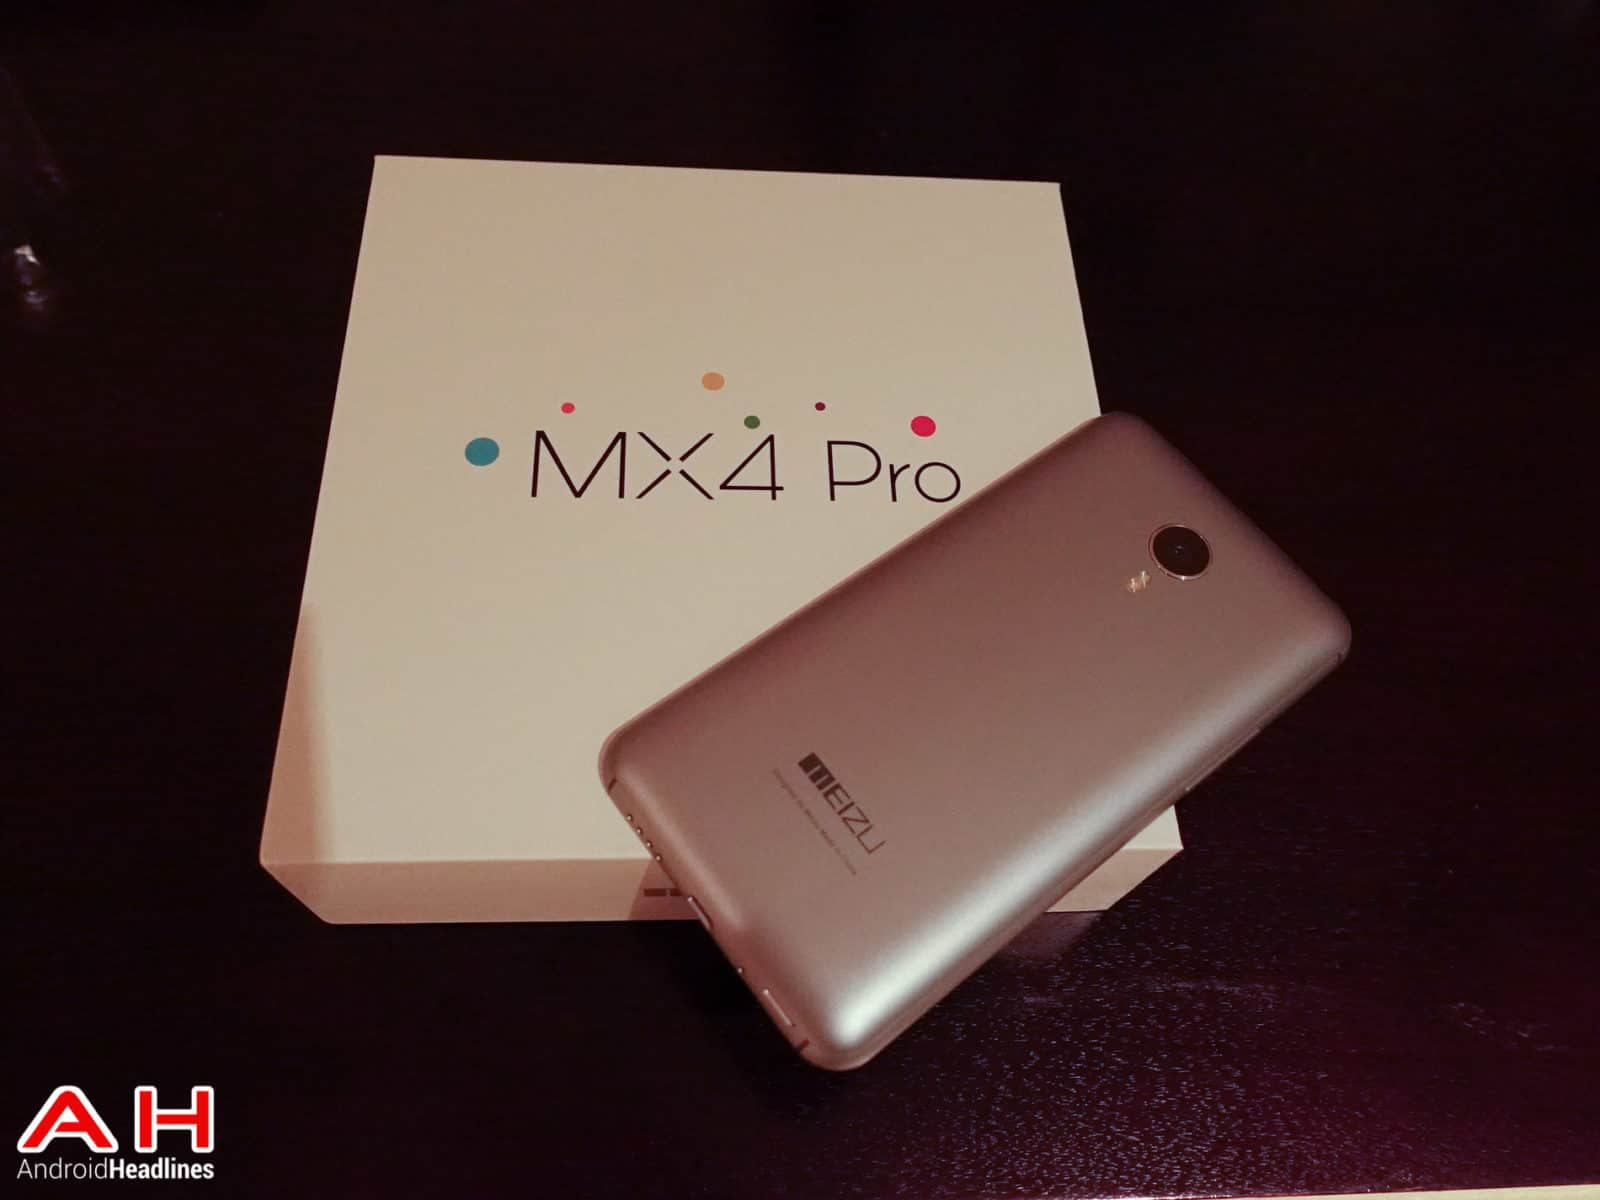 Meizu-MX4-Pro-AH-1